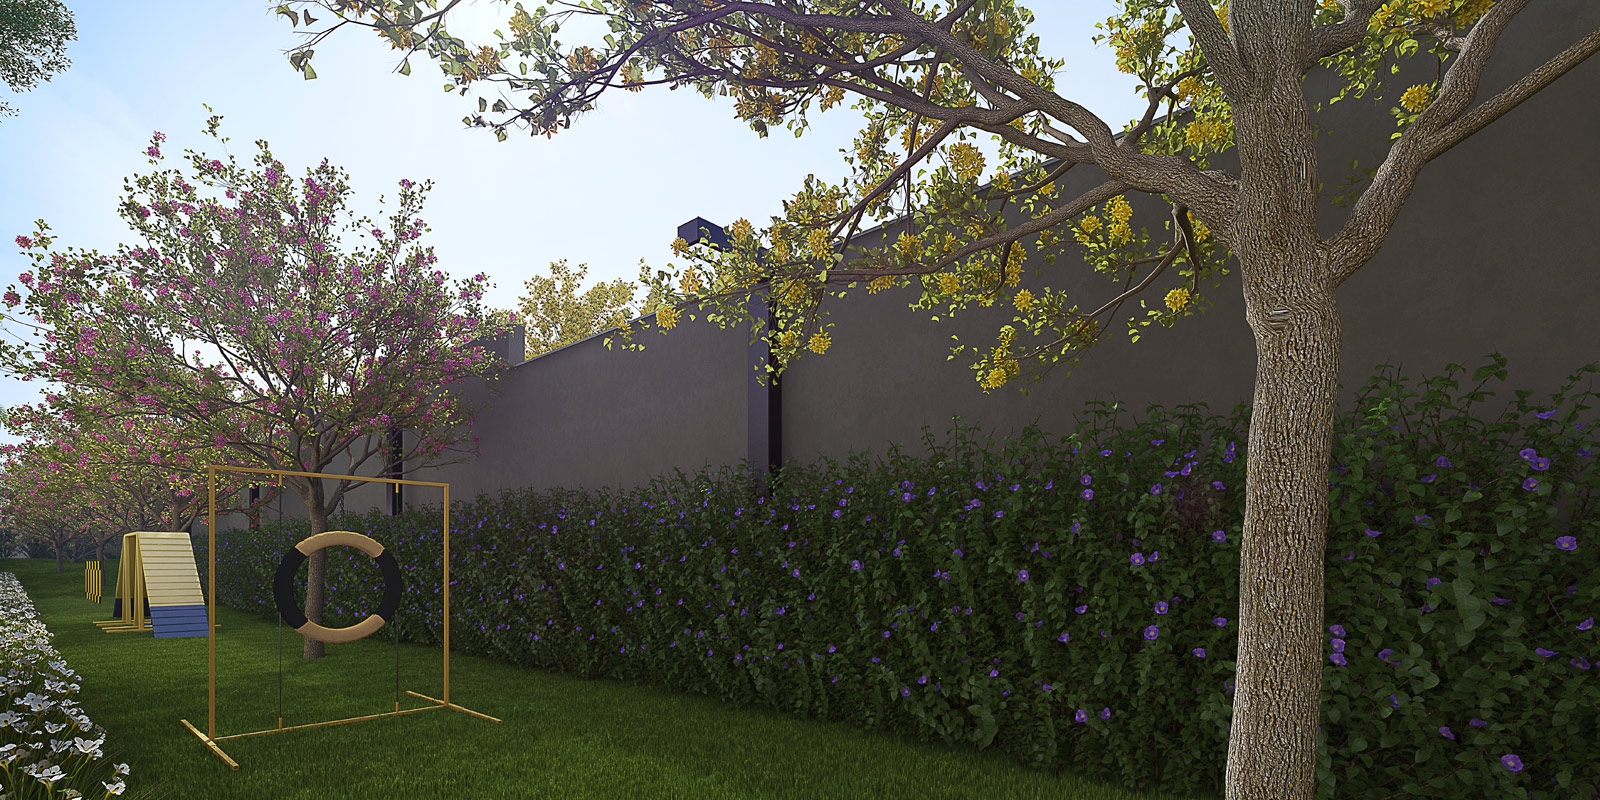 origem-vila-madalena-_galeria_perspectiva_04072016_38d5050ef5